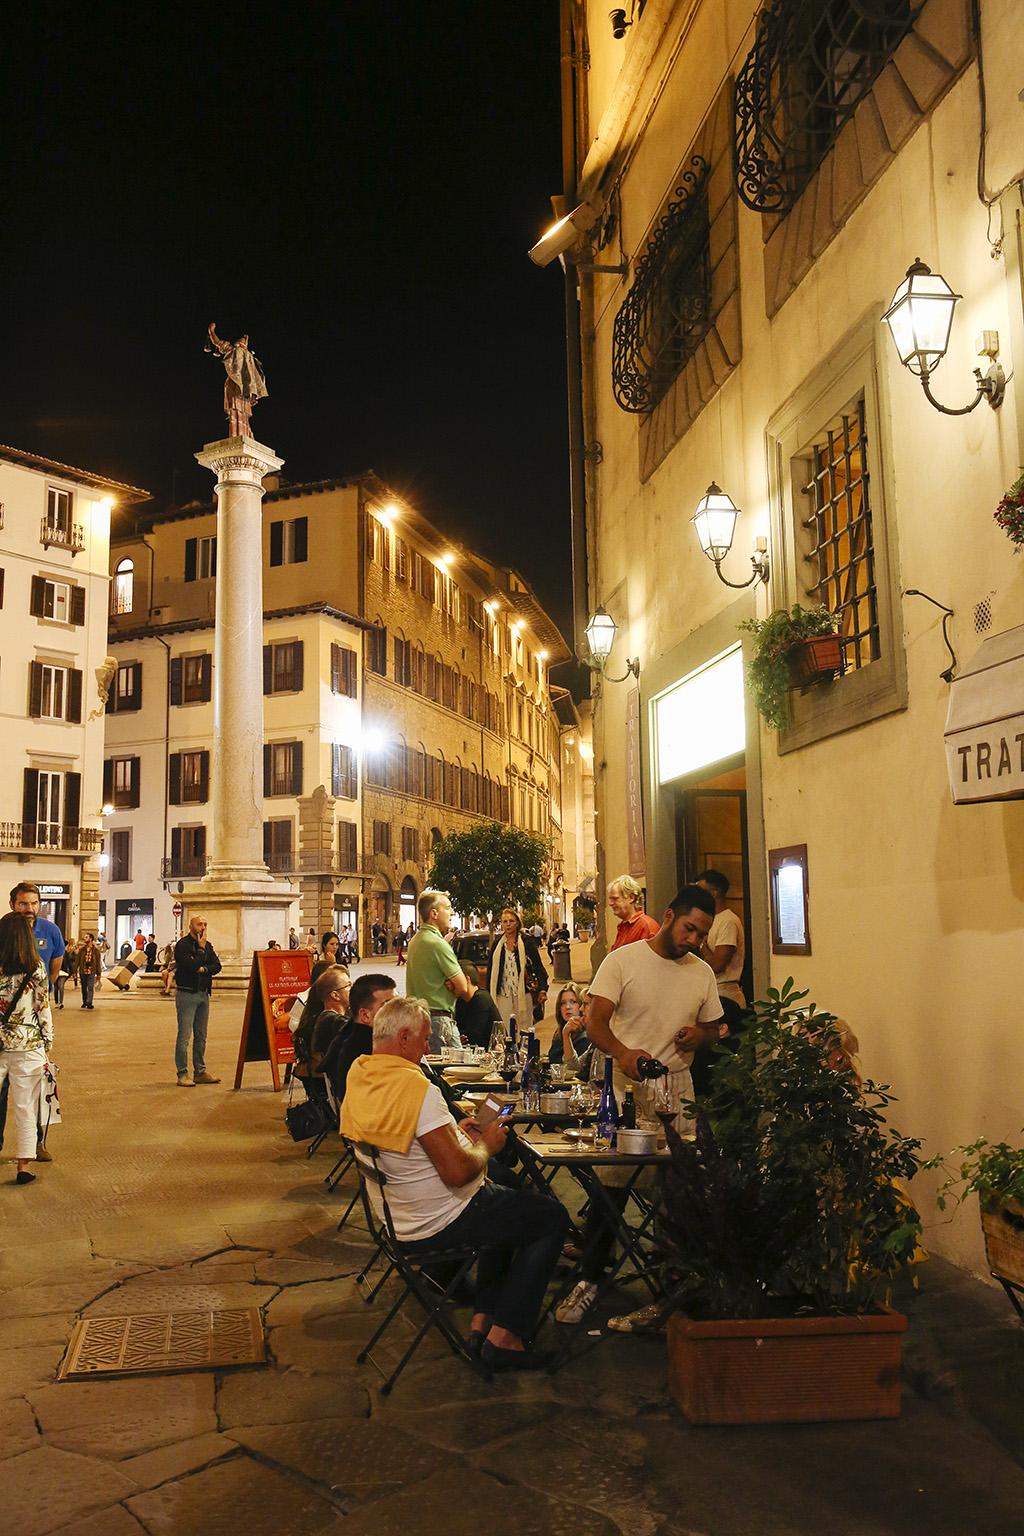 Stylesnooperdan-Florence-travel-guide-28.jpg